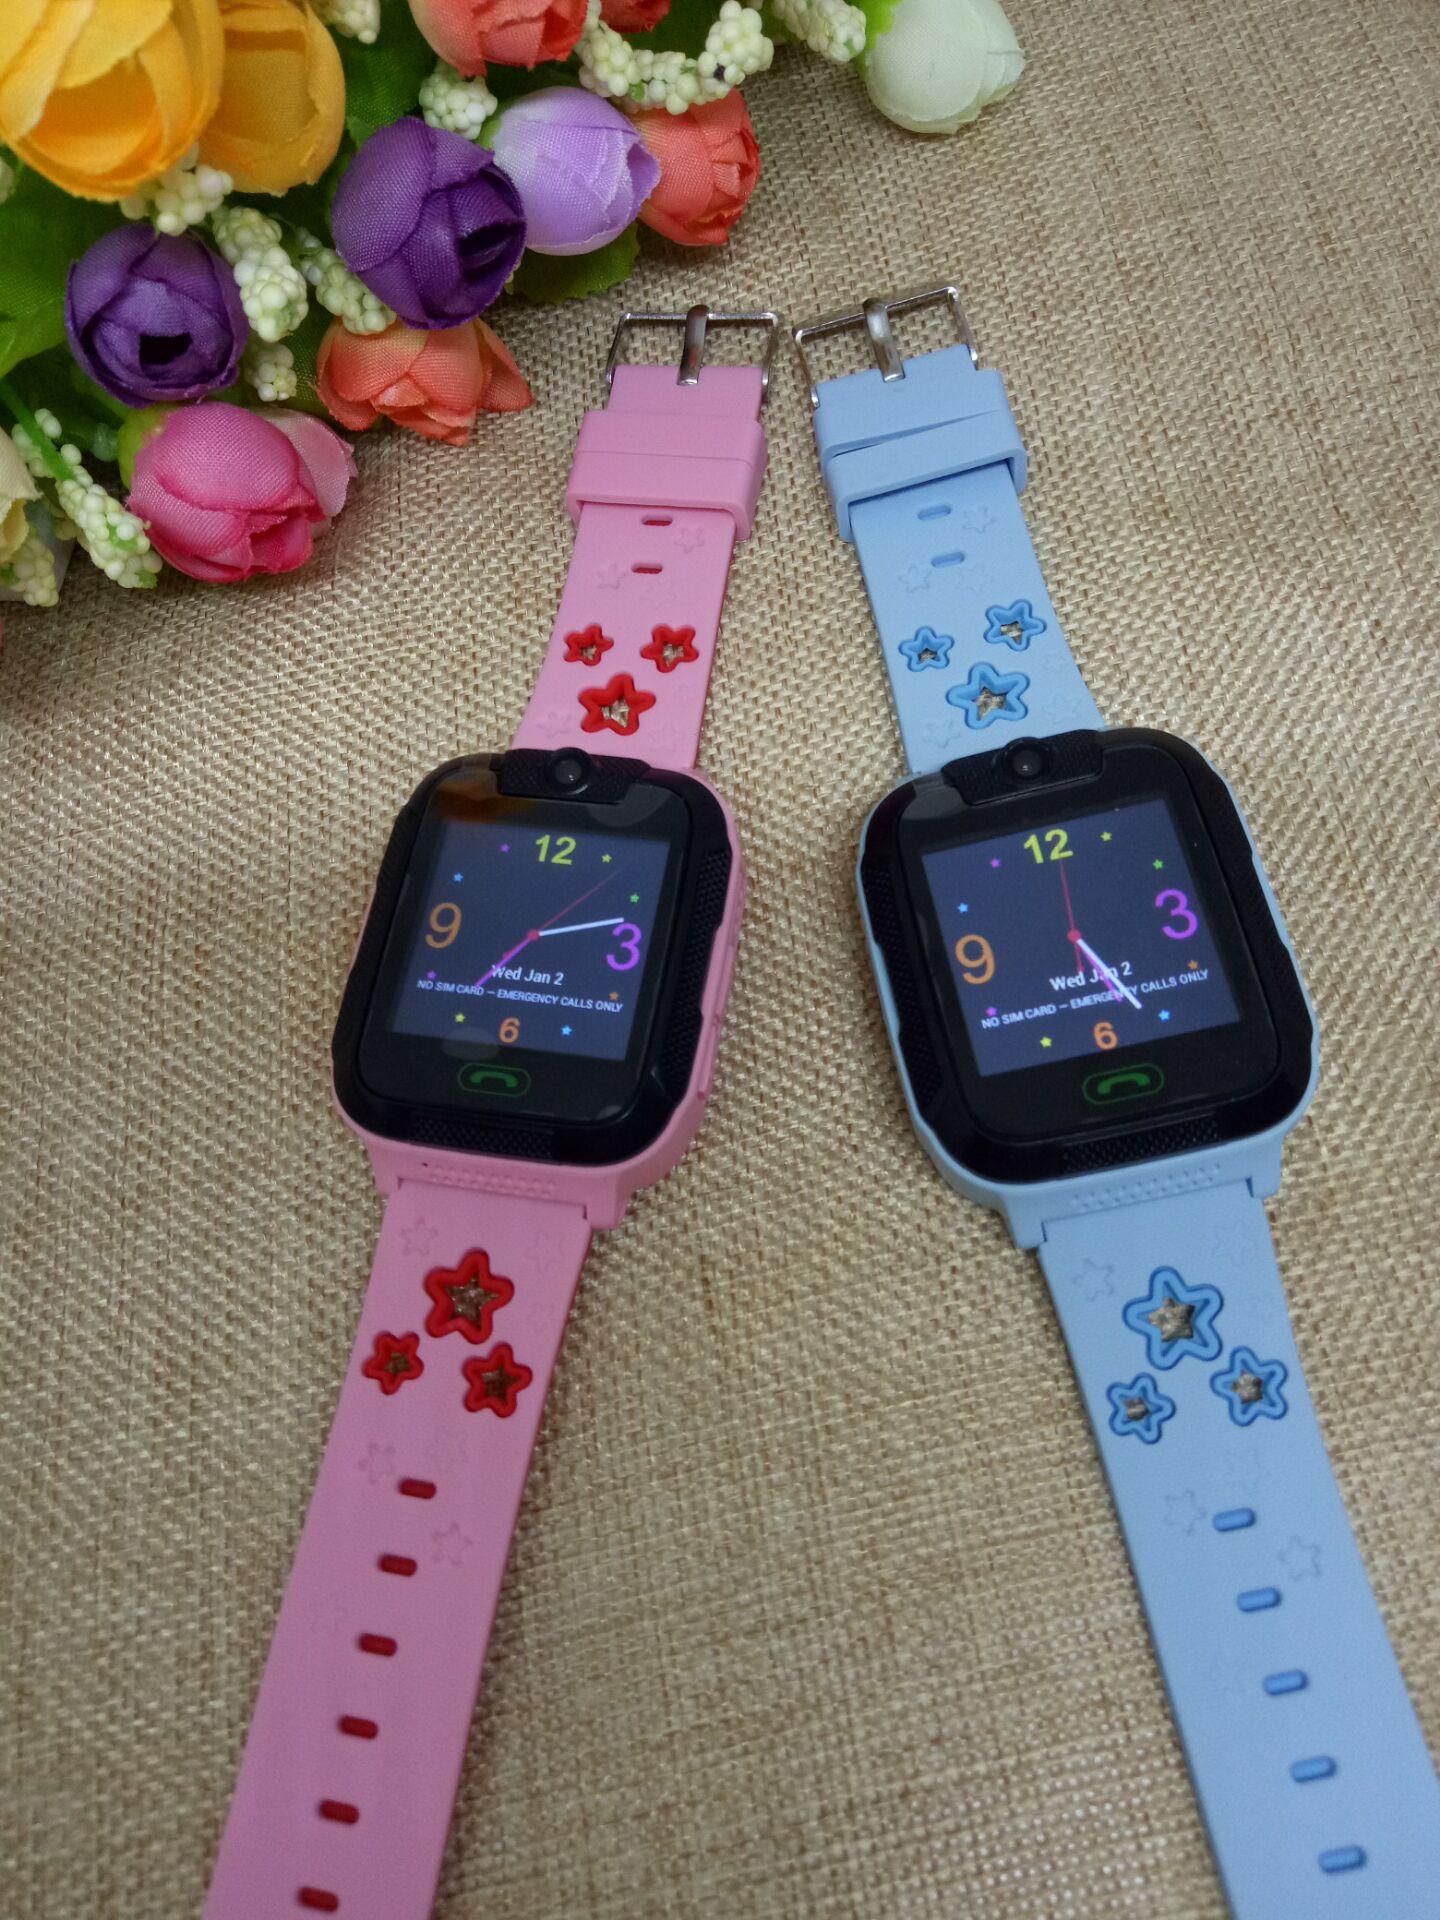 3G network GPS+AGPS+WIFI+LBS remote monitor camera wifi kids gps watch